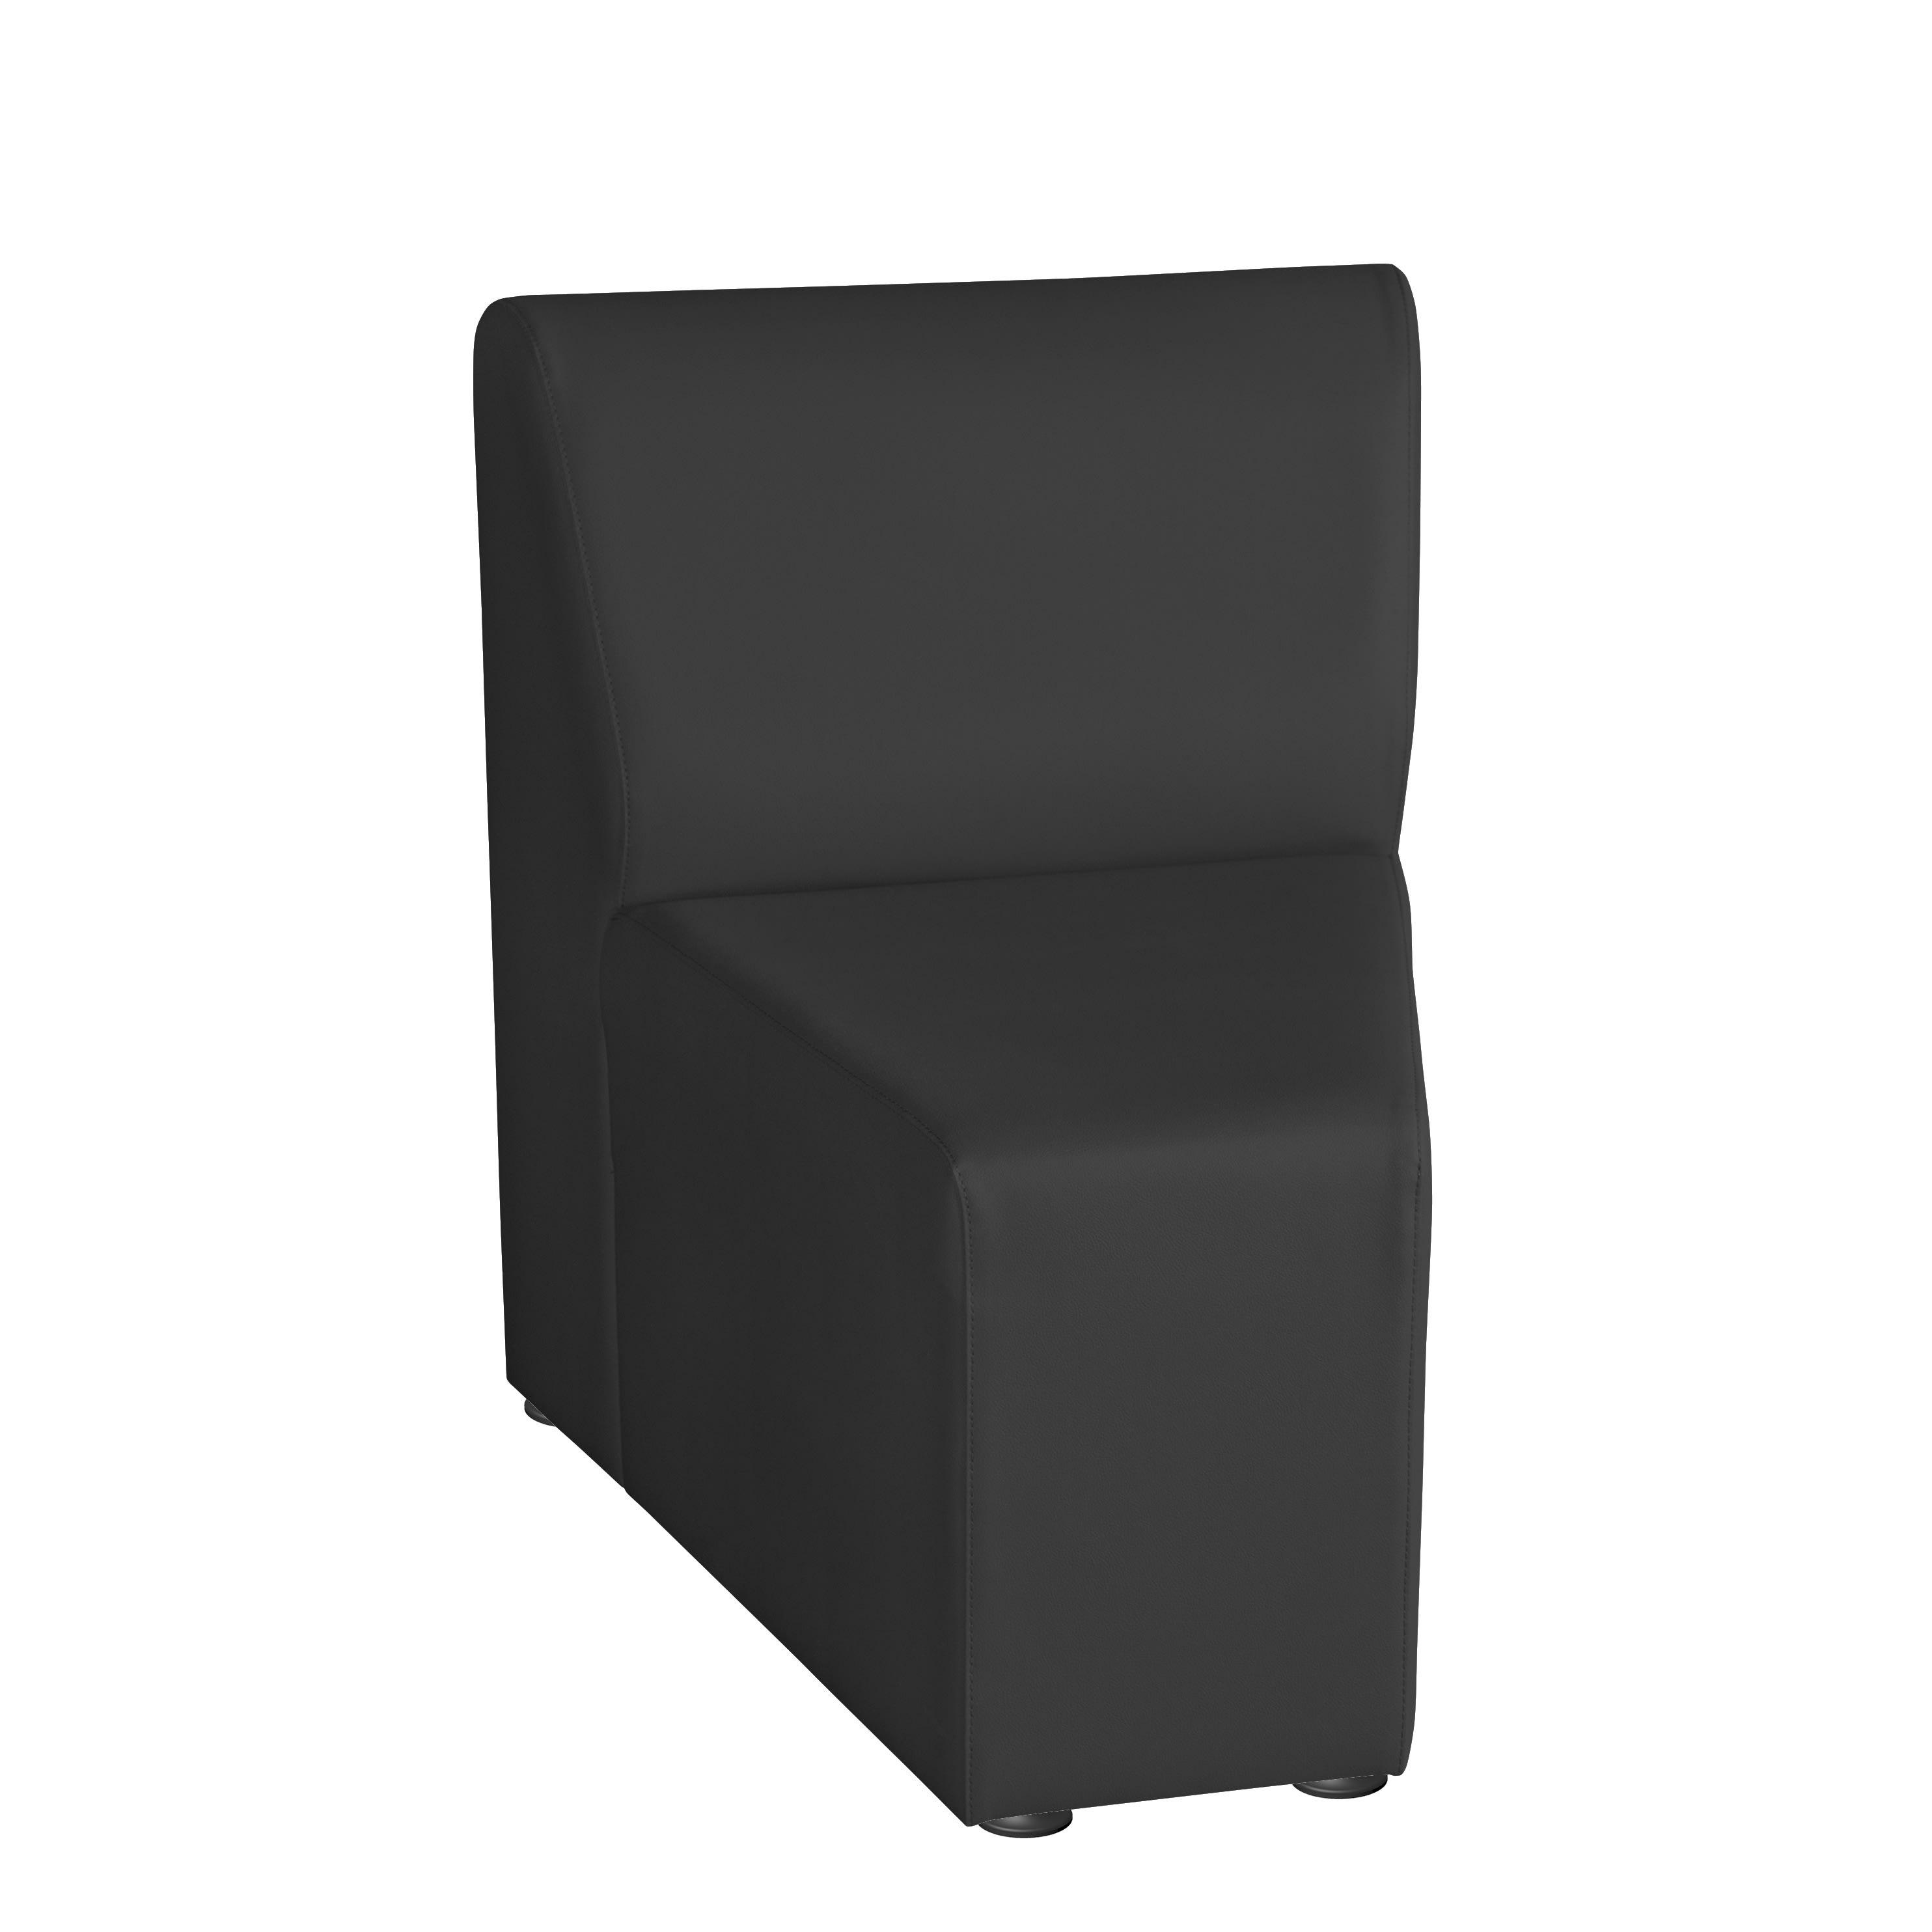 "Marco Inner Wedge Chair, 31.5"" x 24.5"", Black"